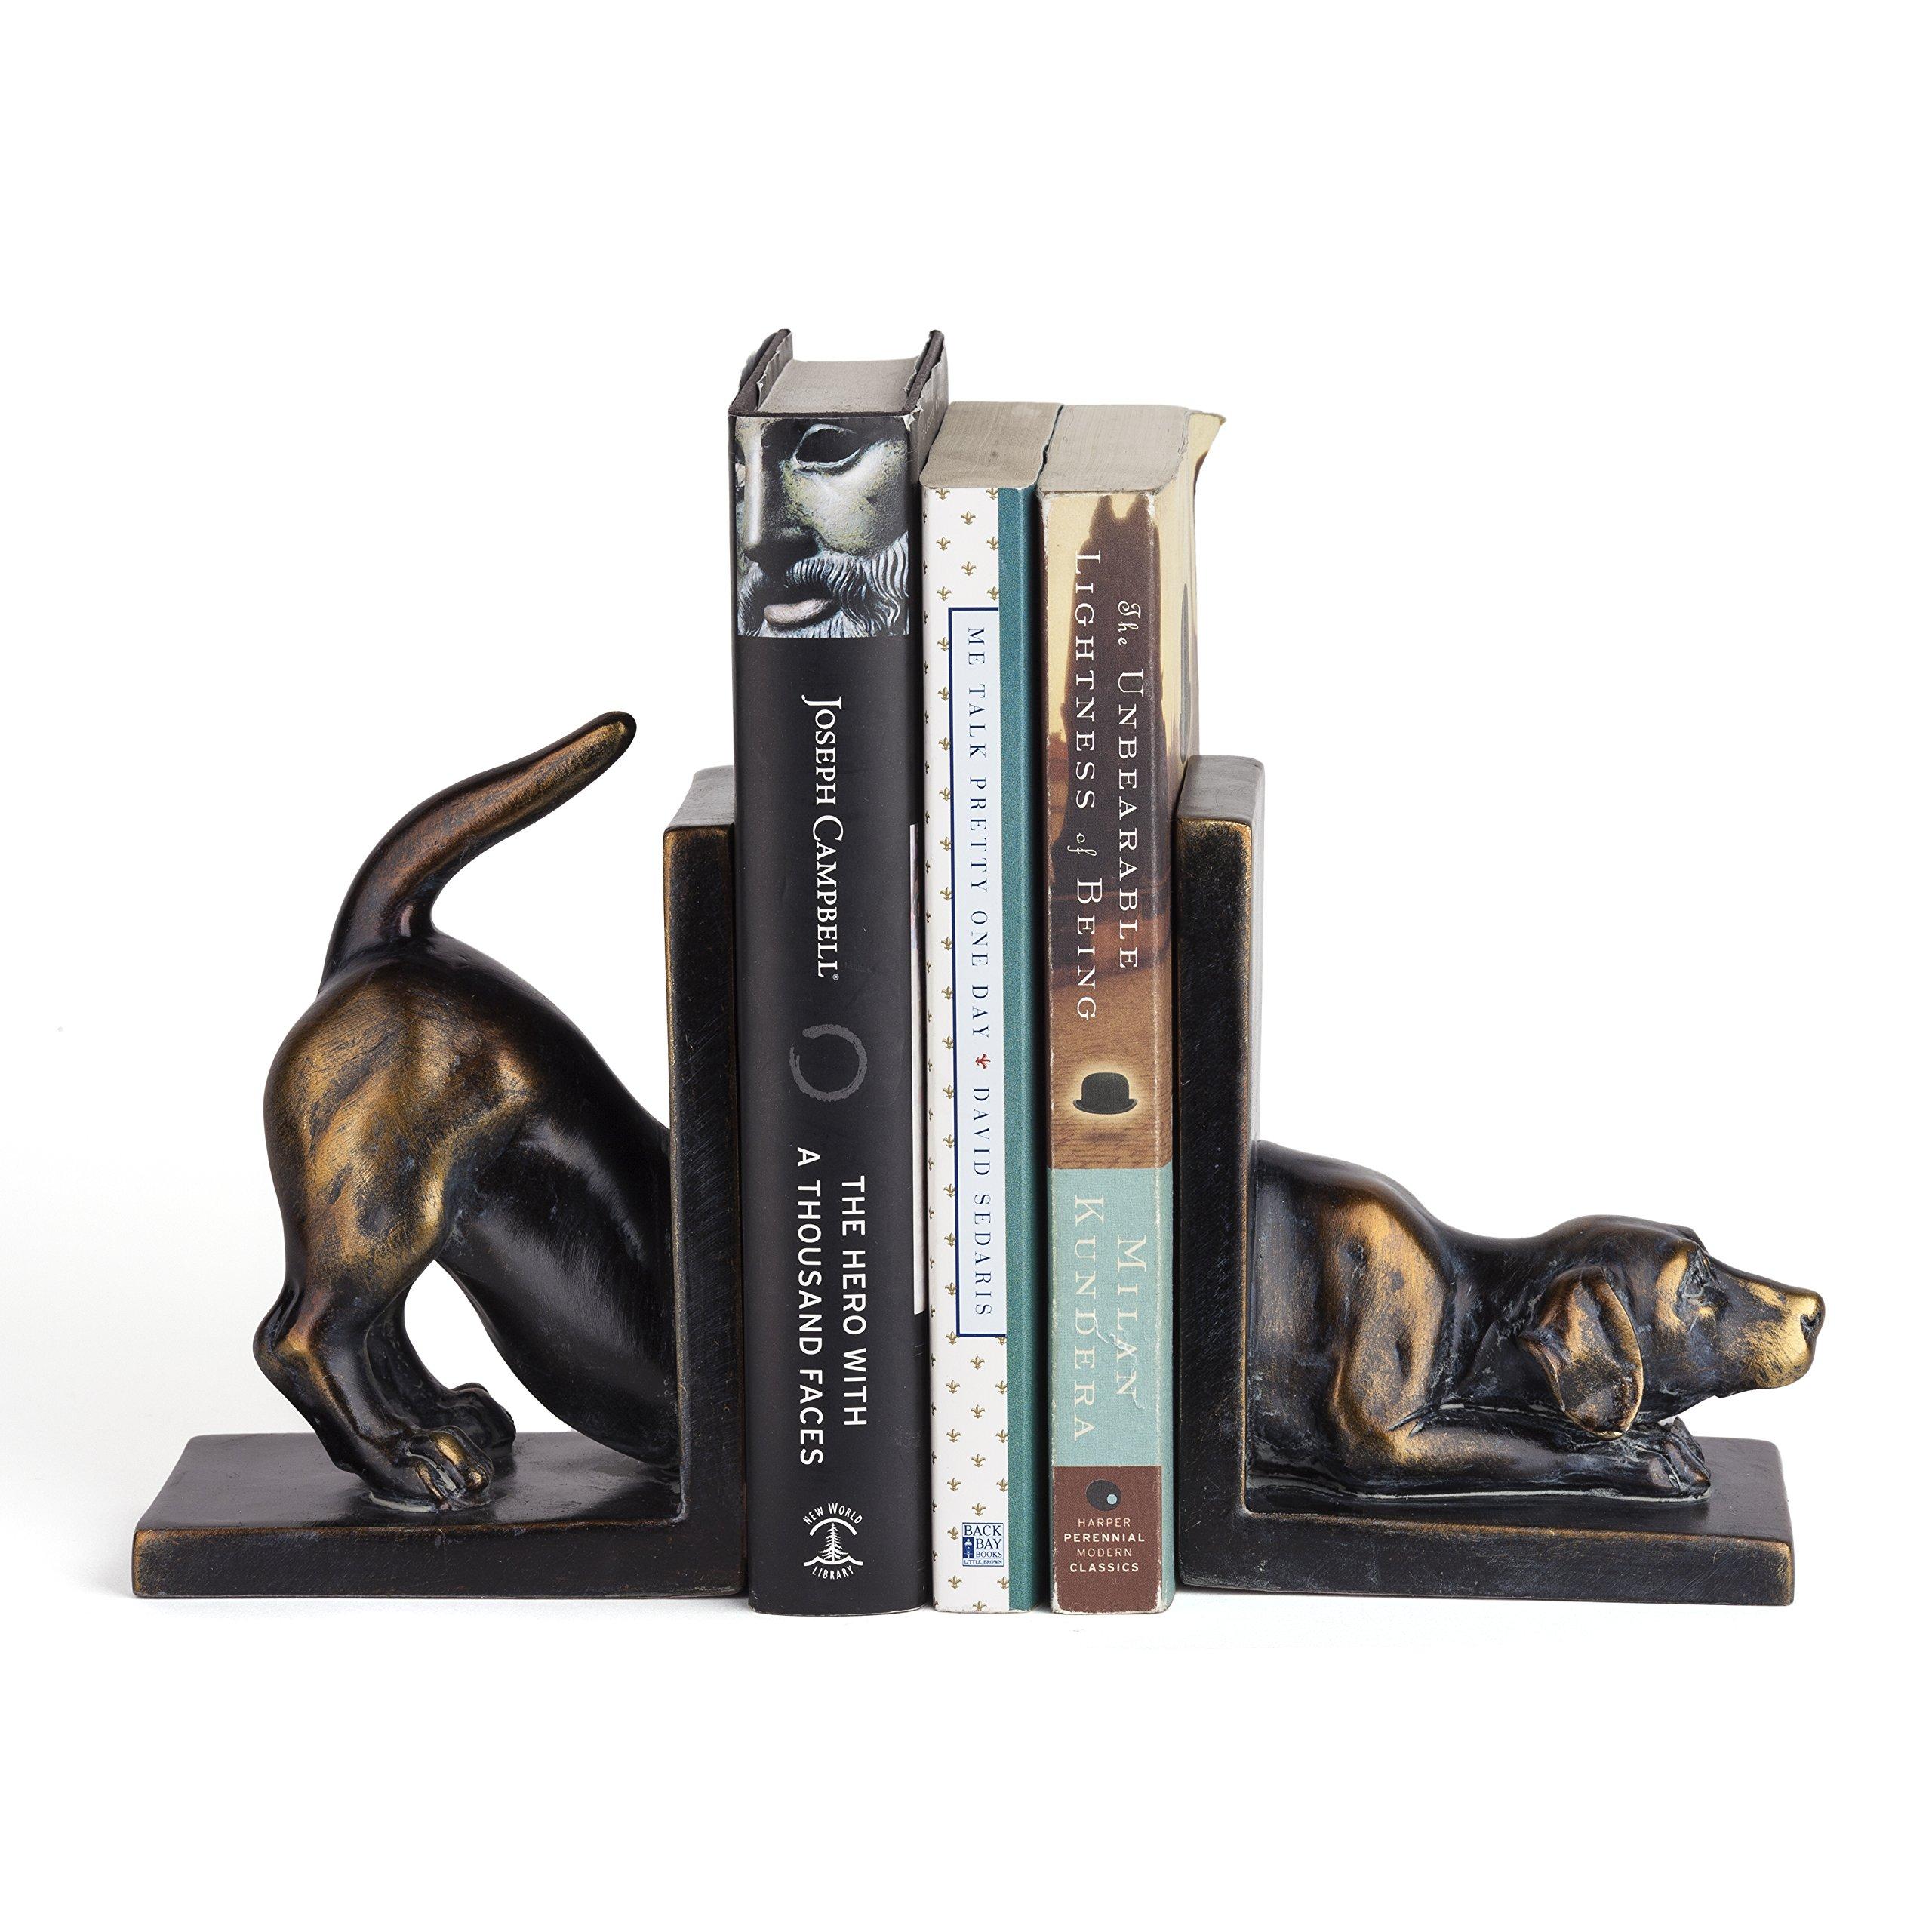 Danya B. DS782 Unique Decorative Animal Shelf Décor - Labrador Dog Bookend Set by Danya B